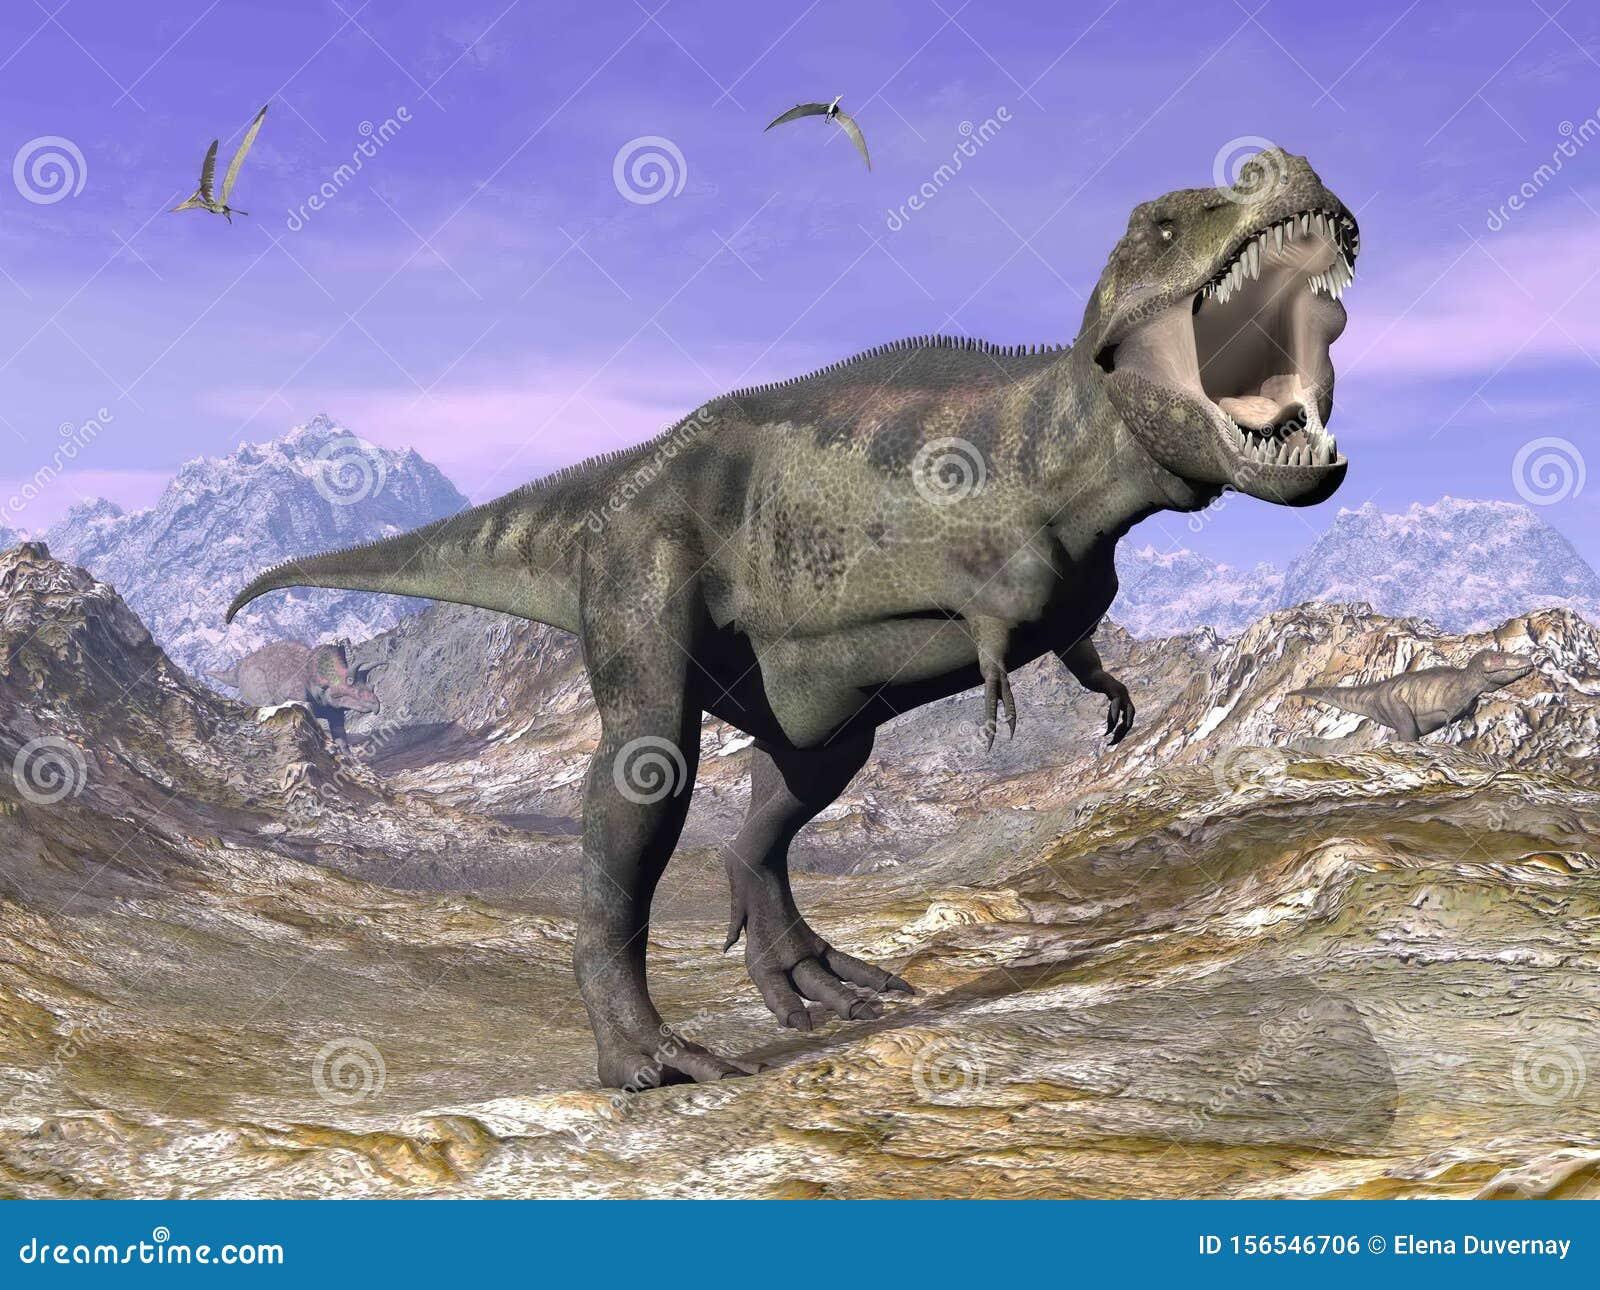 Tyrannosaurus T-Rex roaring in nature - 3D render